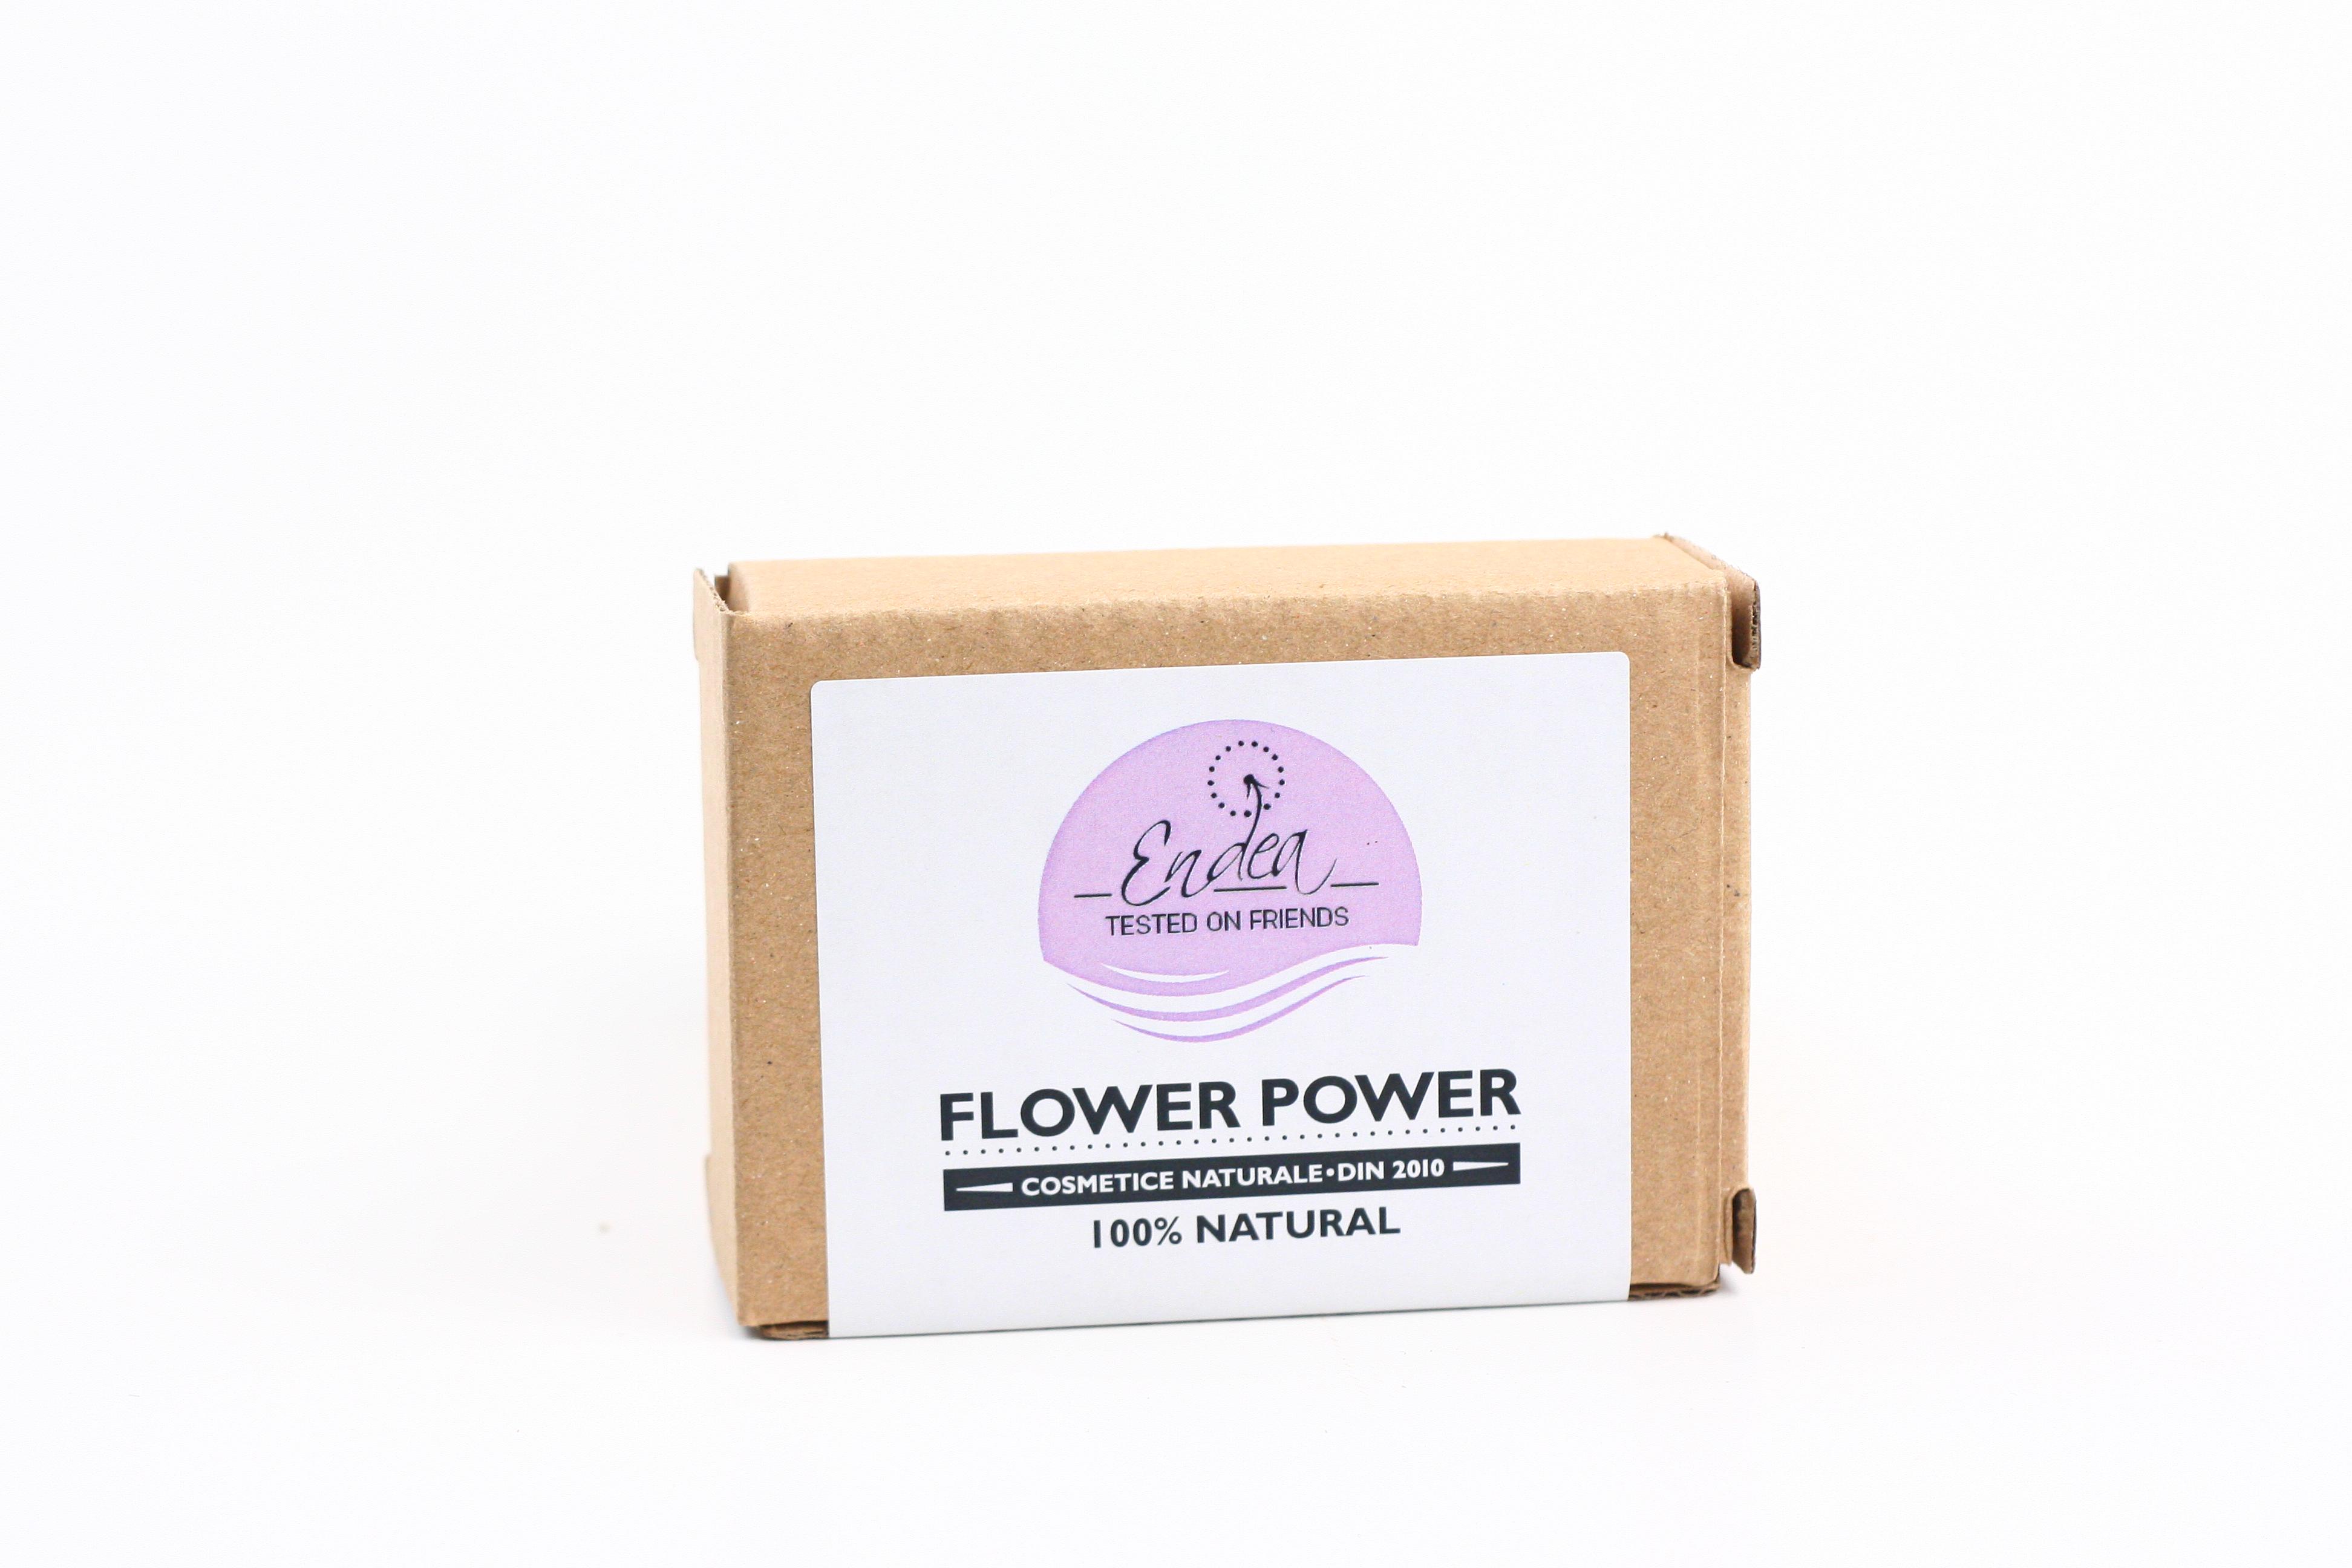 Sapun - Flower Power thumbnail